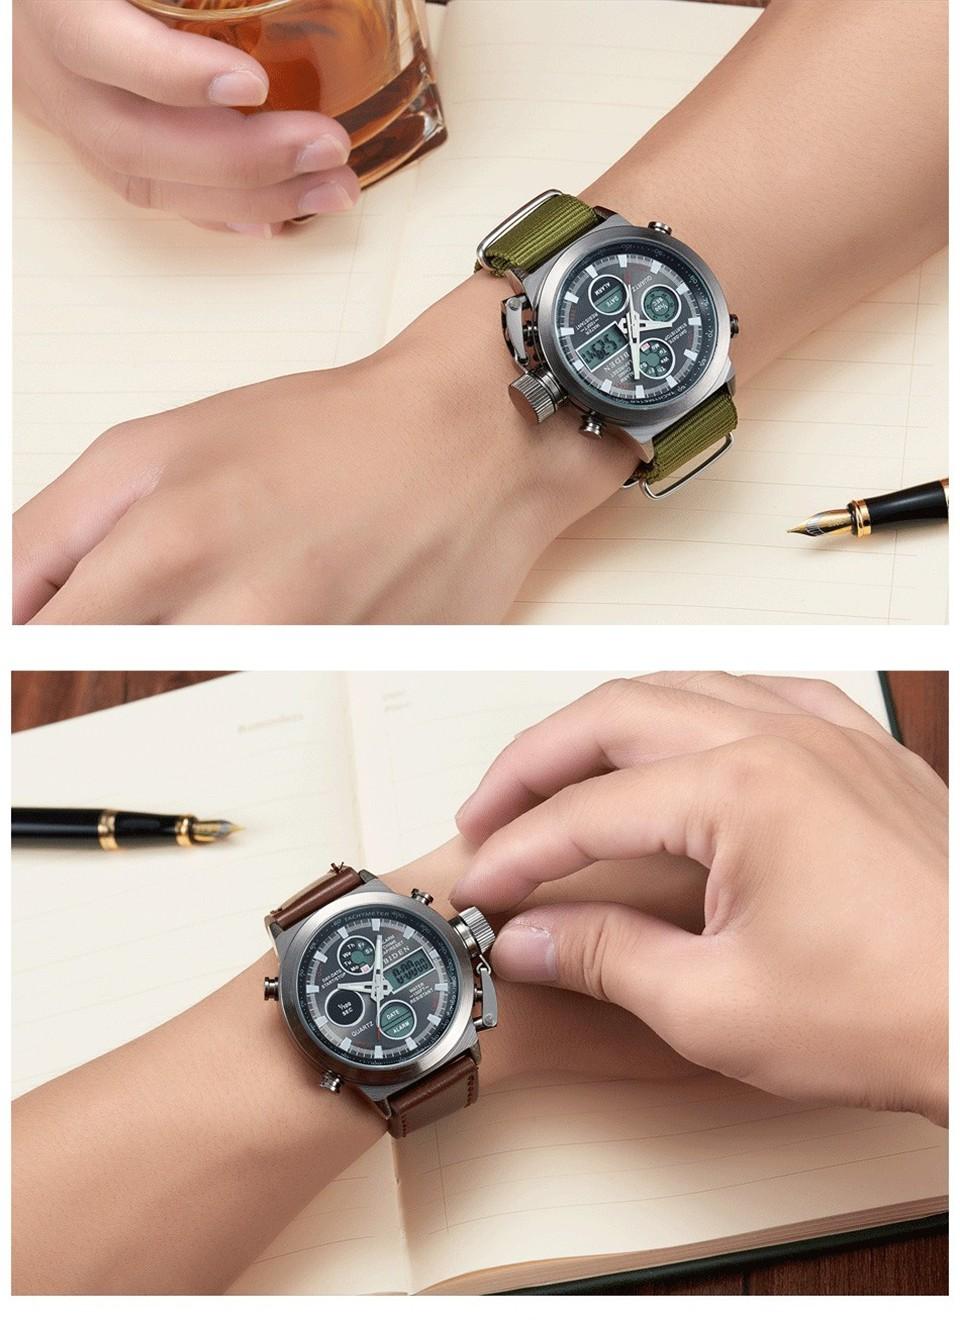 Watches Men's Luxury Brand BIDEN Dive LED Digital Watches Sport Military Genuine Quartz Watch Men Relogio Masculino reloj hombre